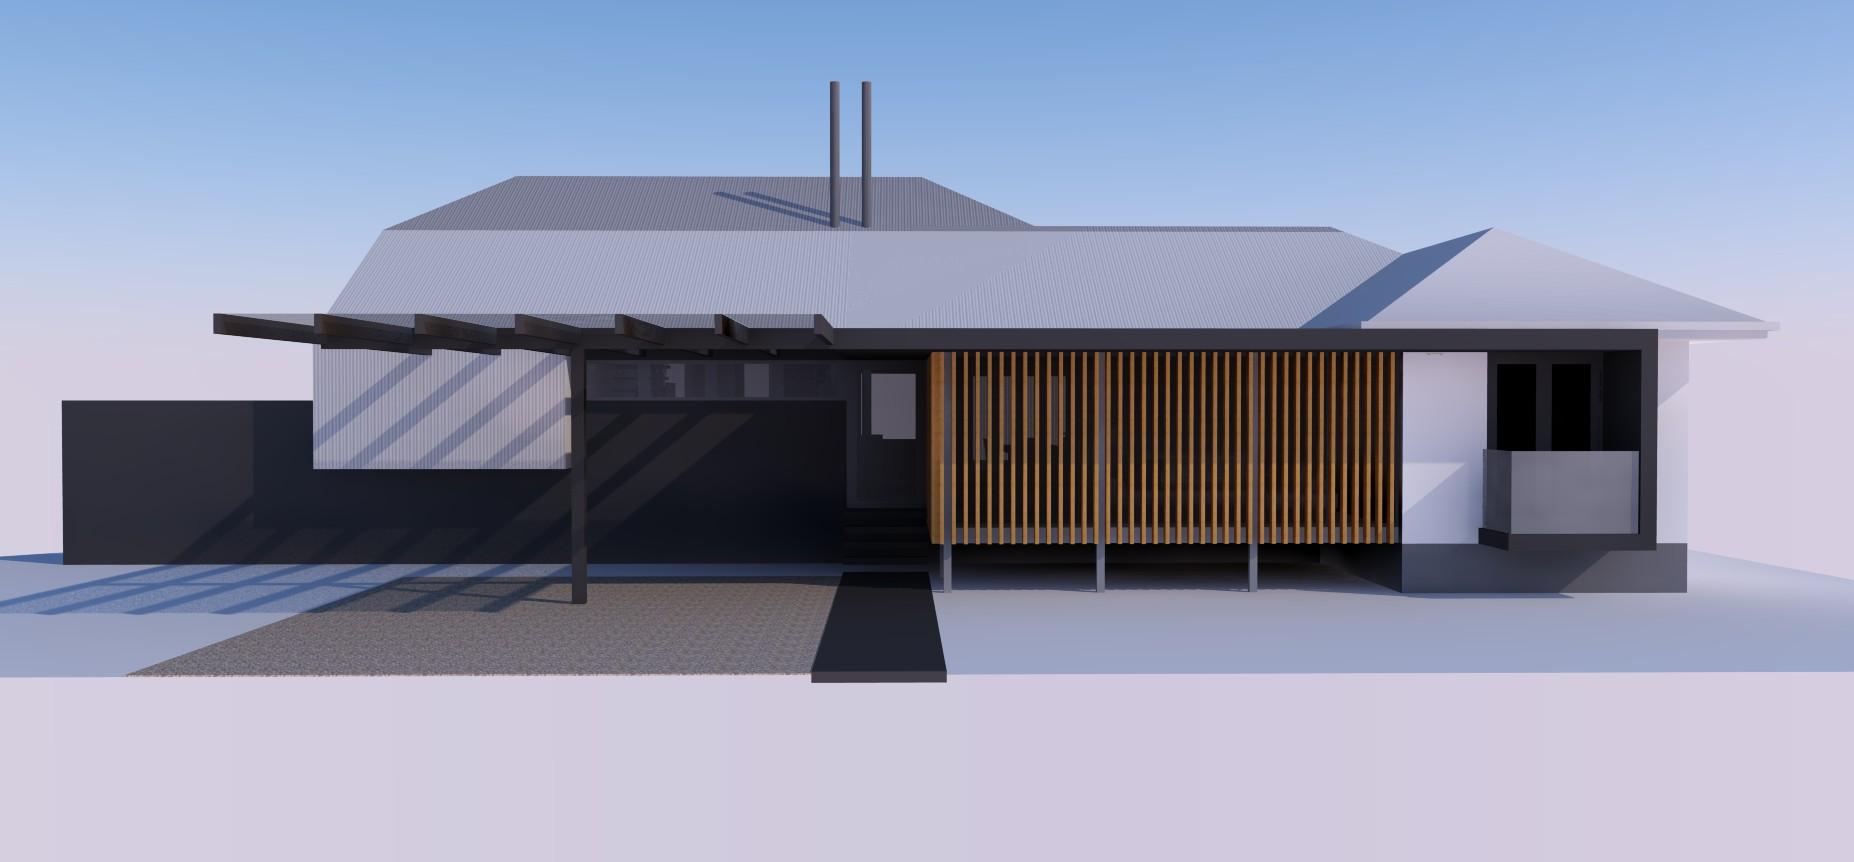 Residence Sandgate - East Elevation